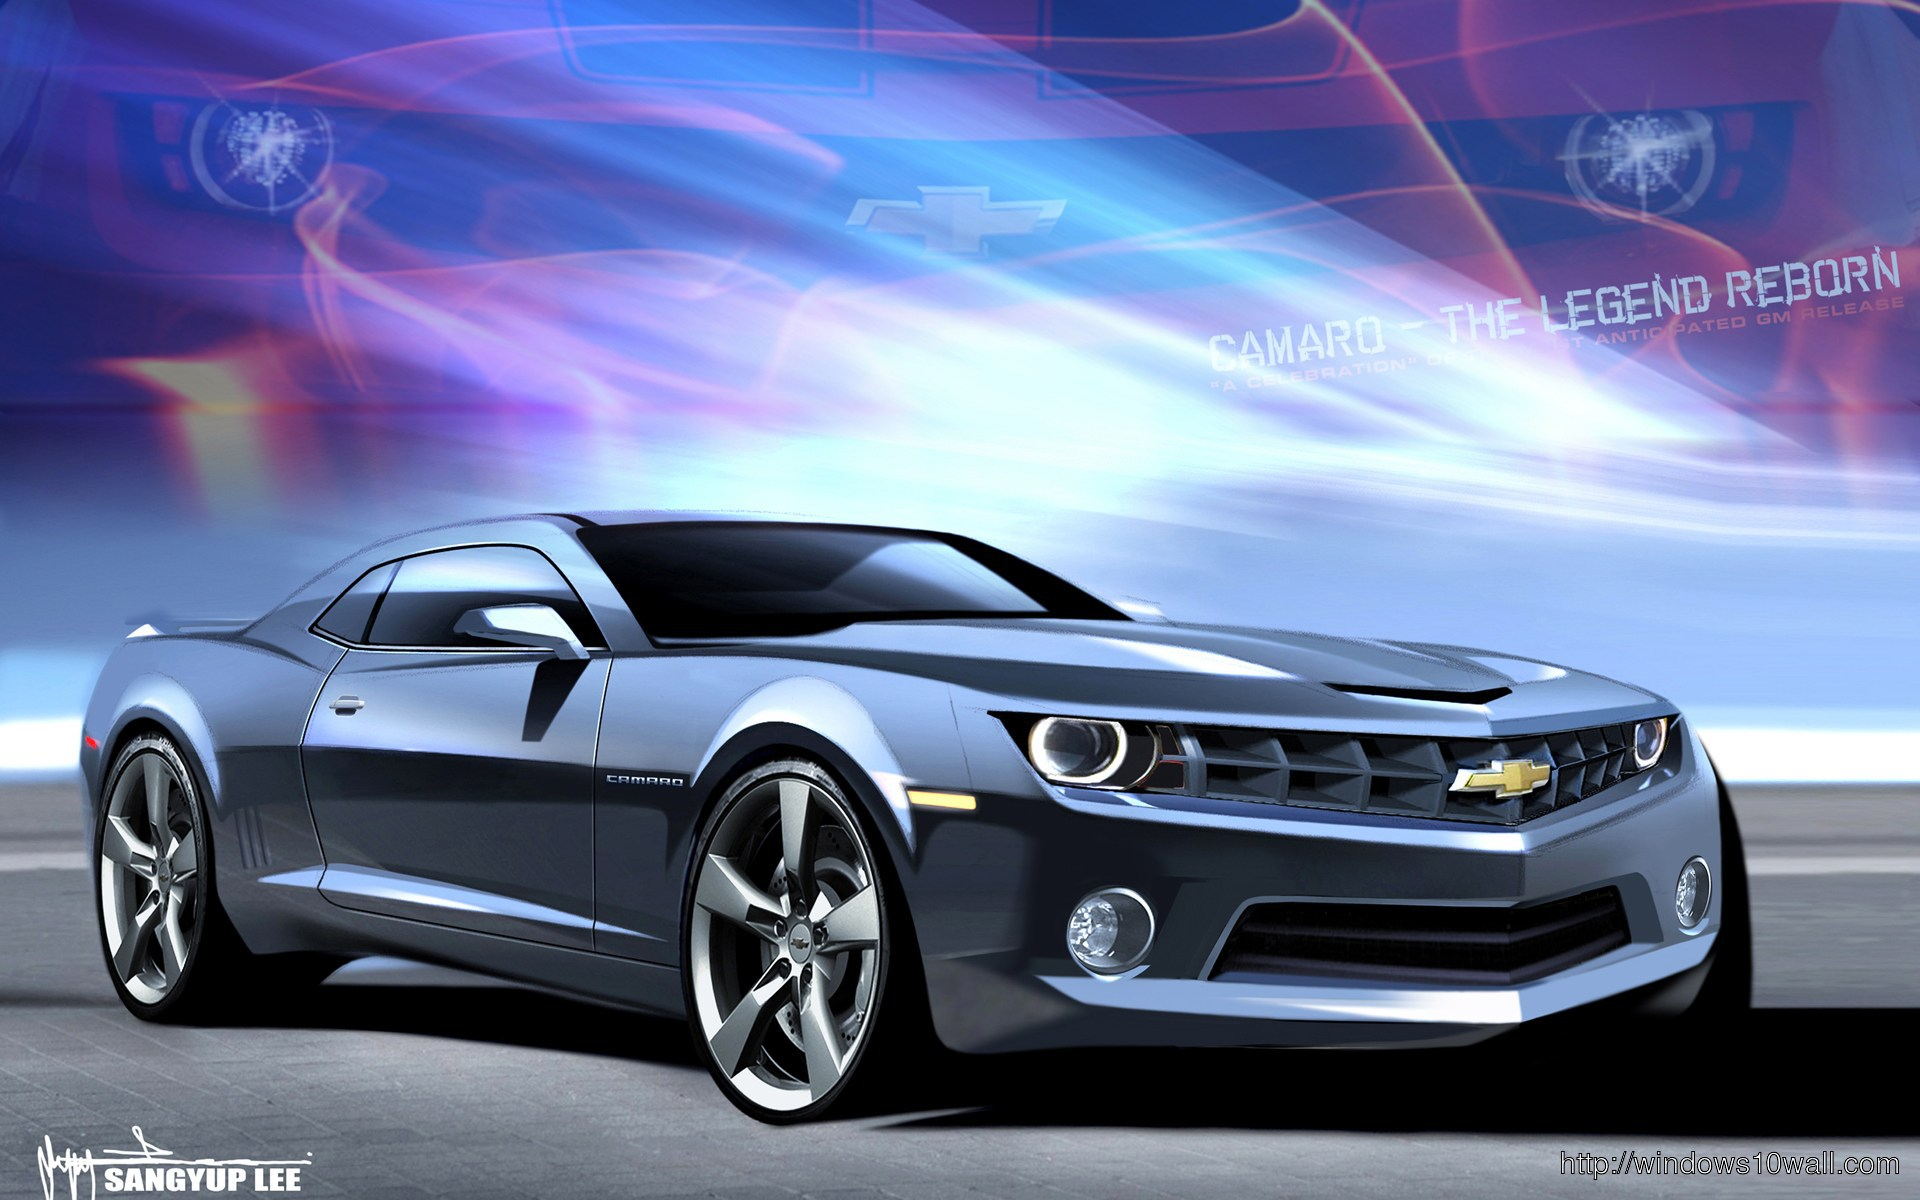 Chevrolet Silverado Background Wallpaper